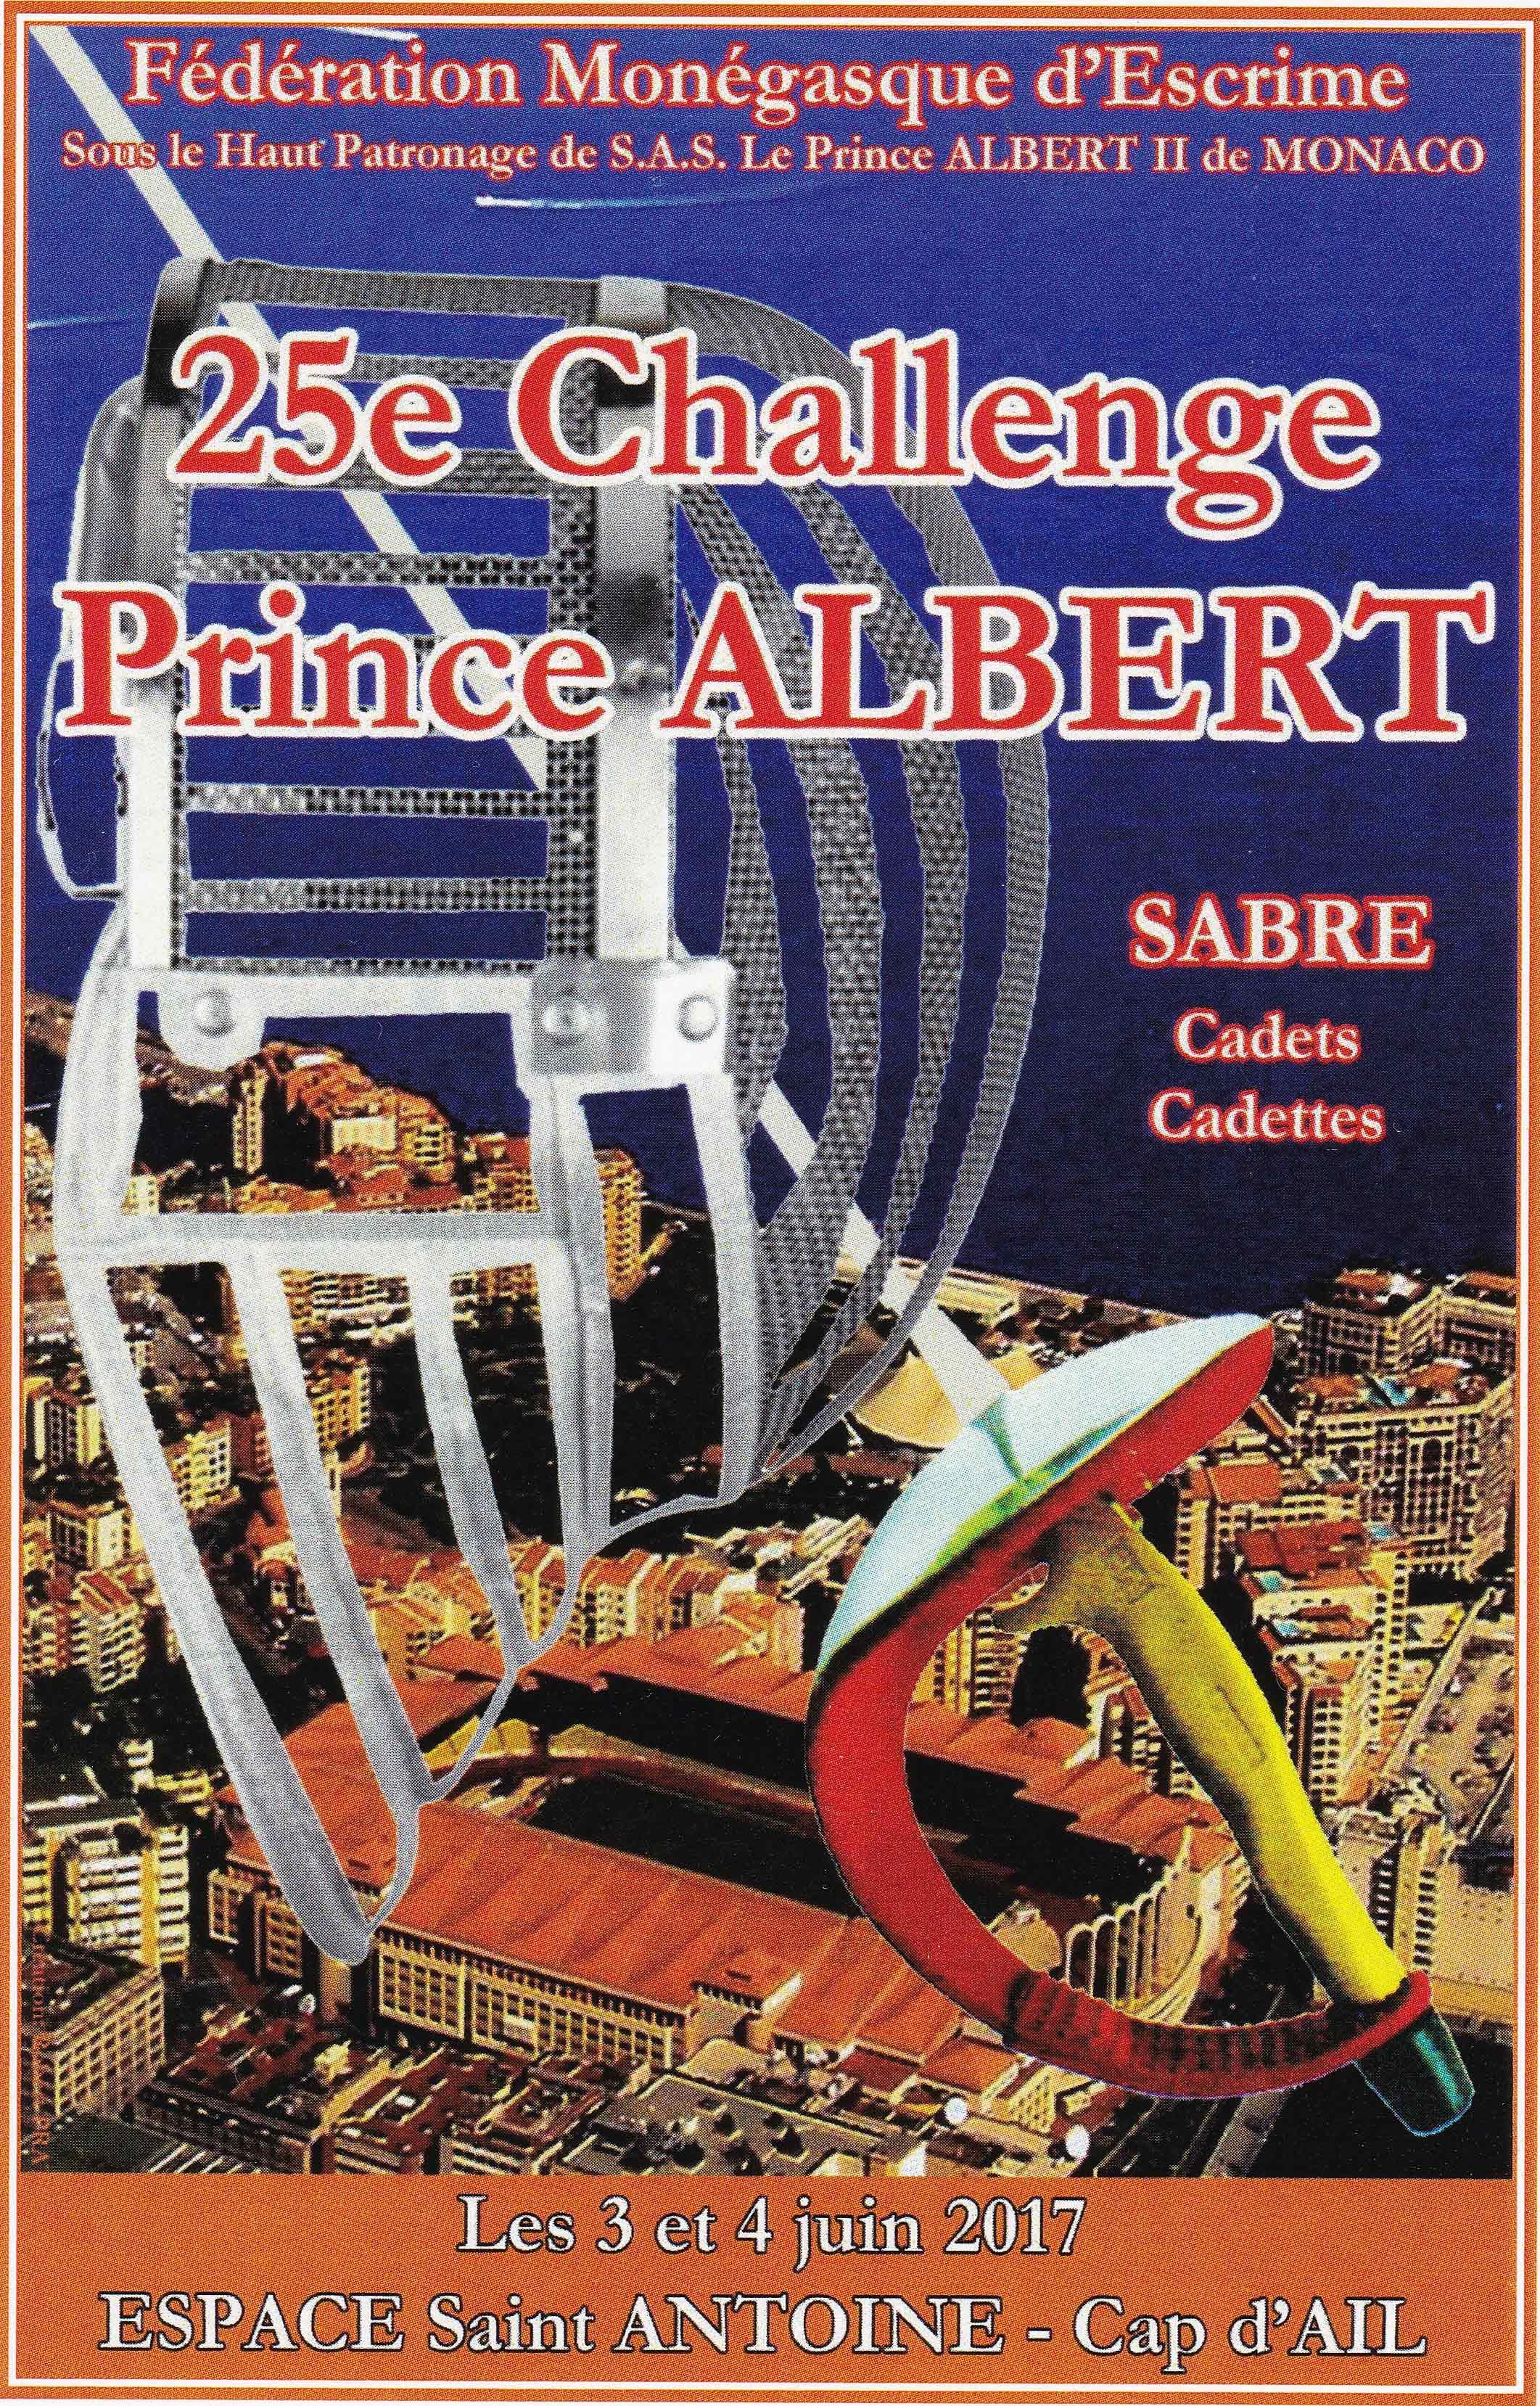 25ème Challenge Prince ALBERT